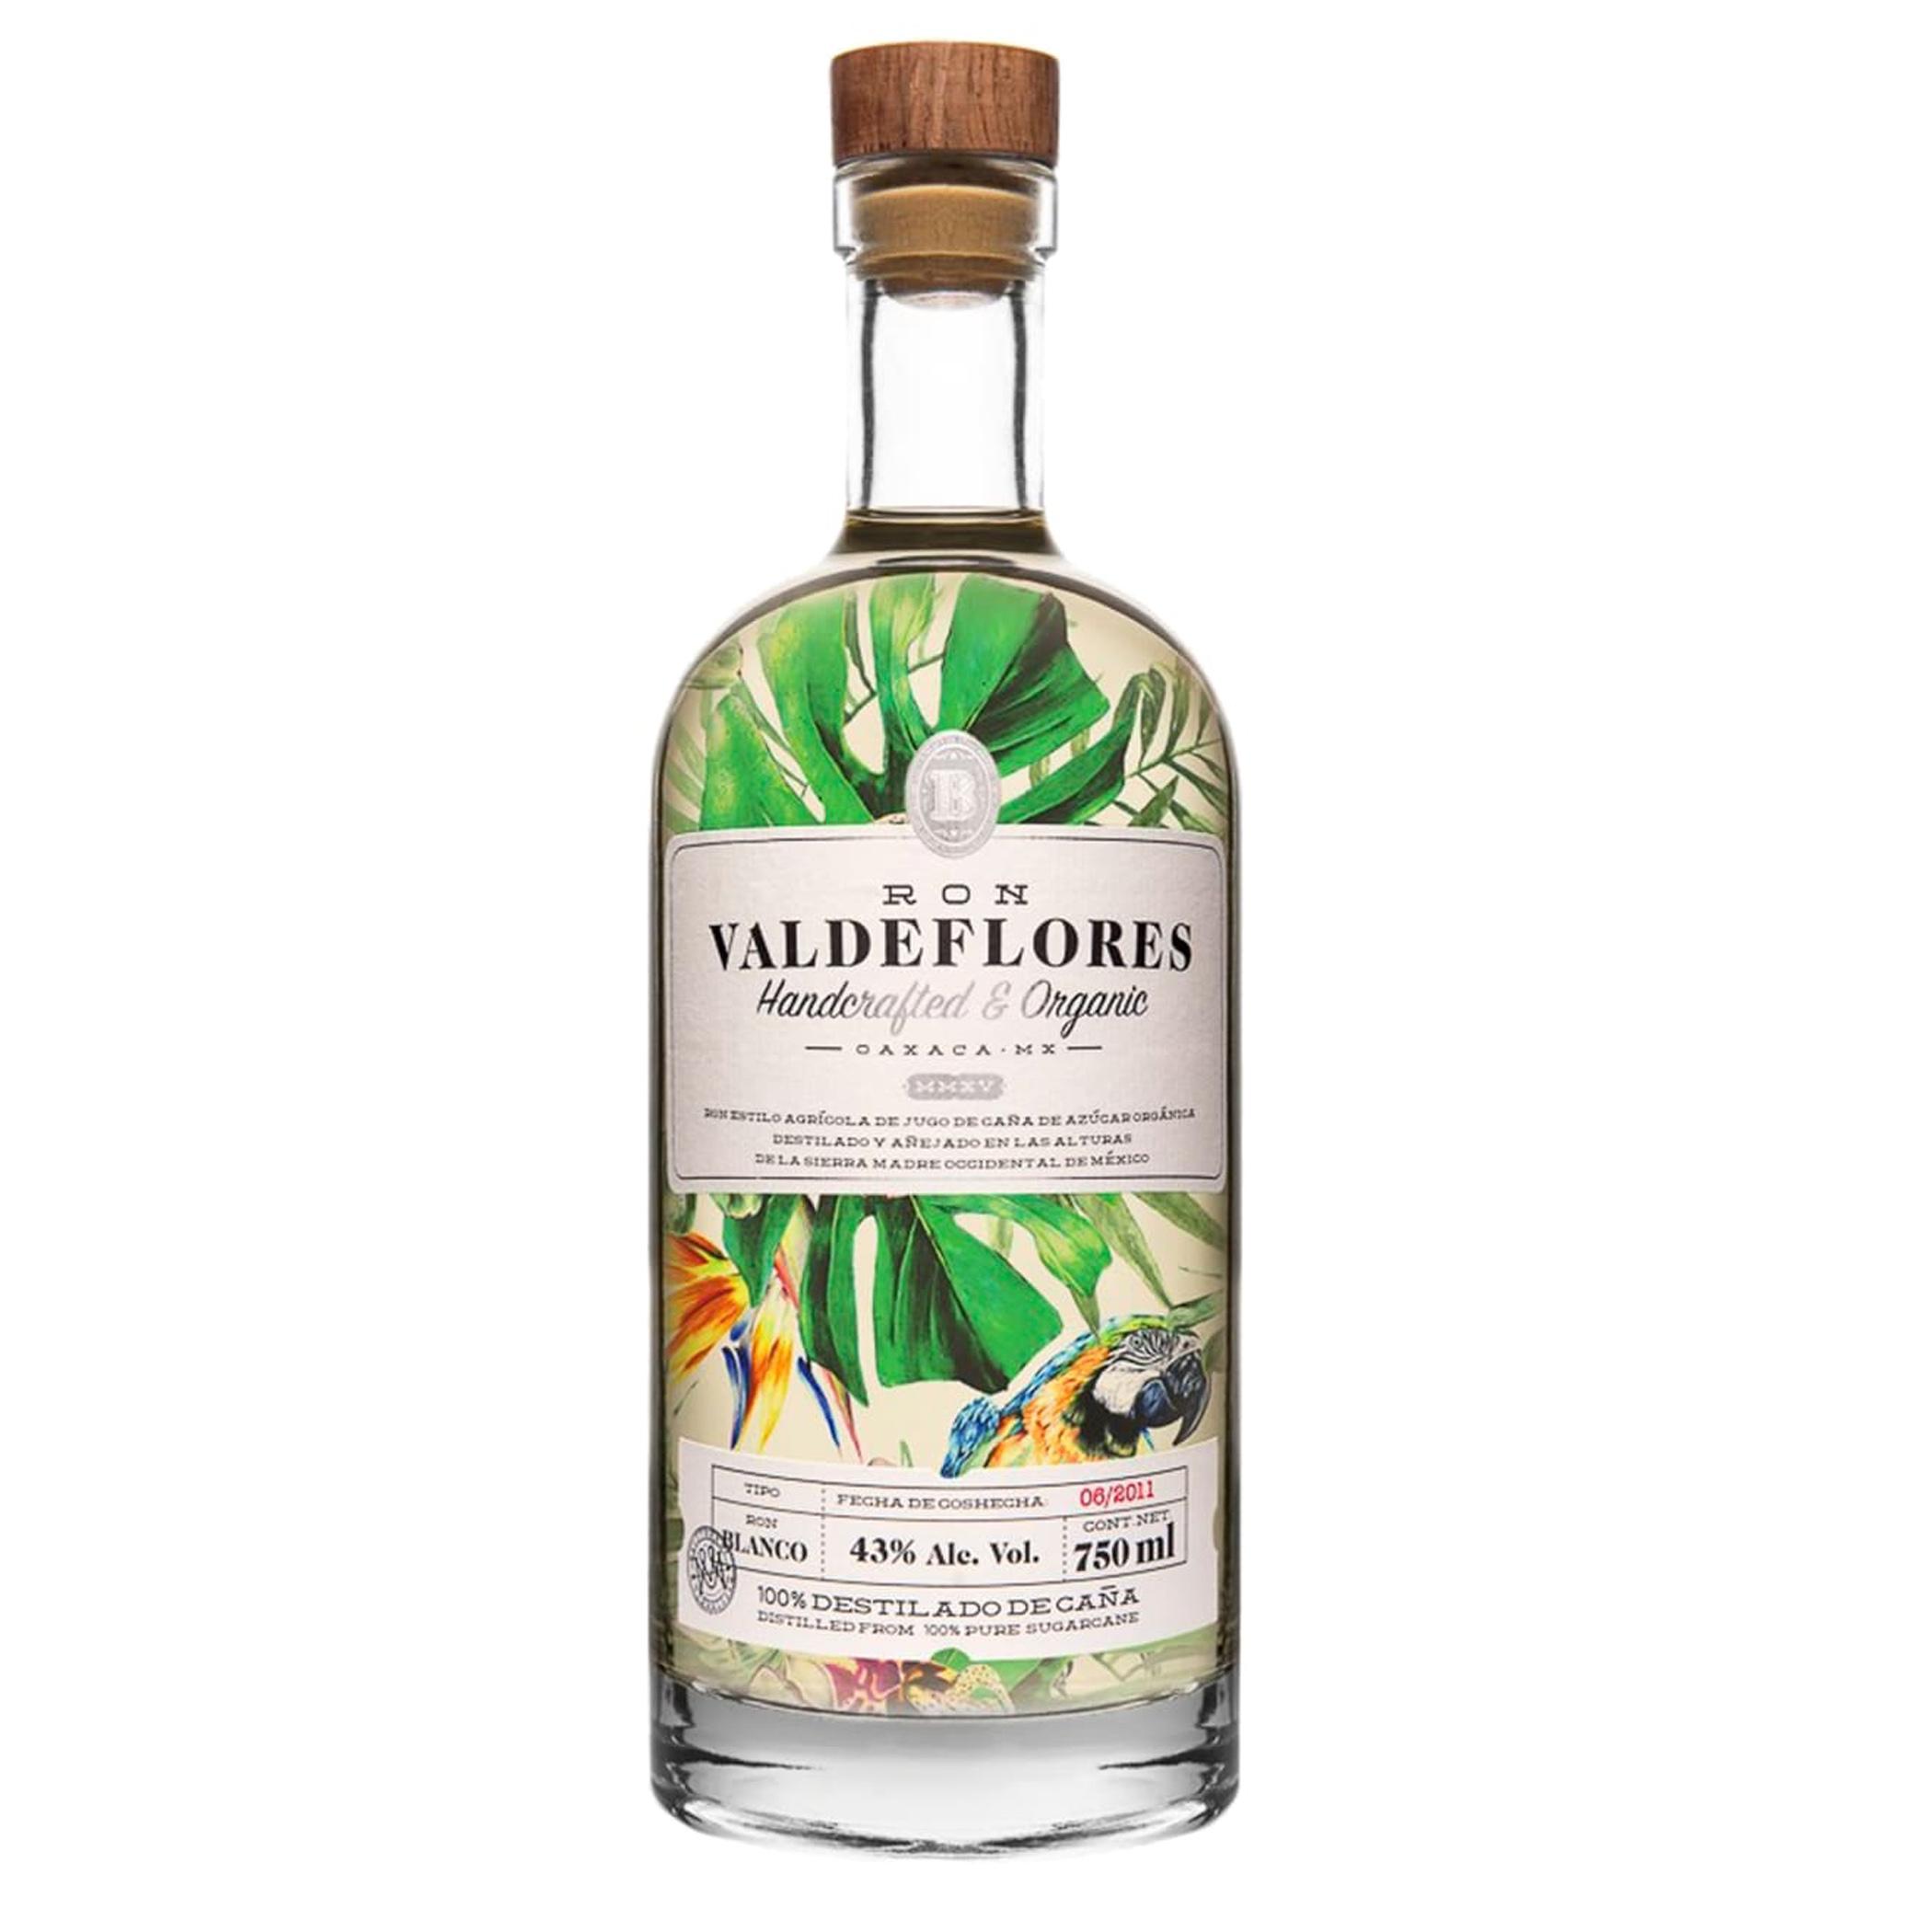 Ron Valdeflores Blanco Rum